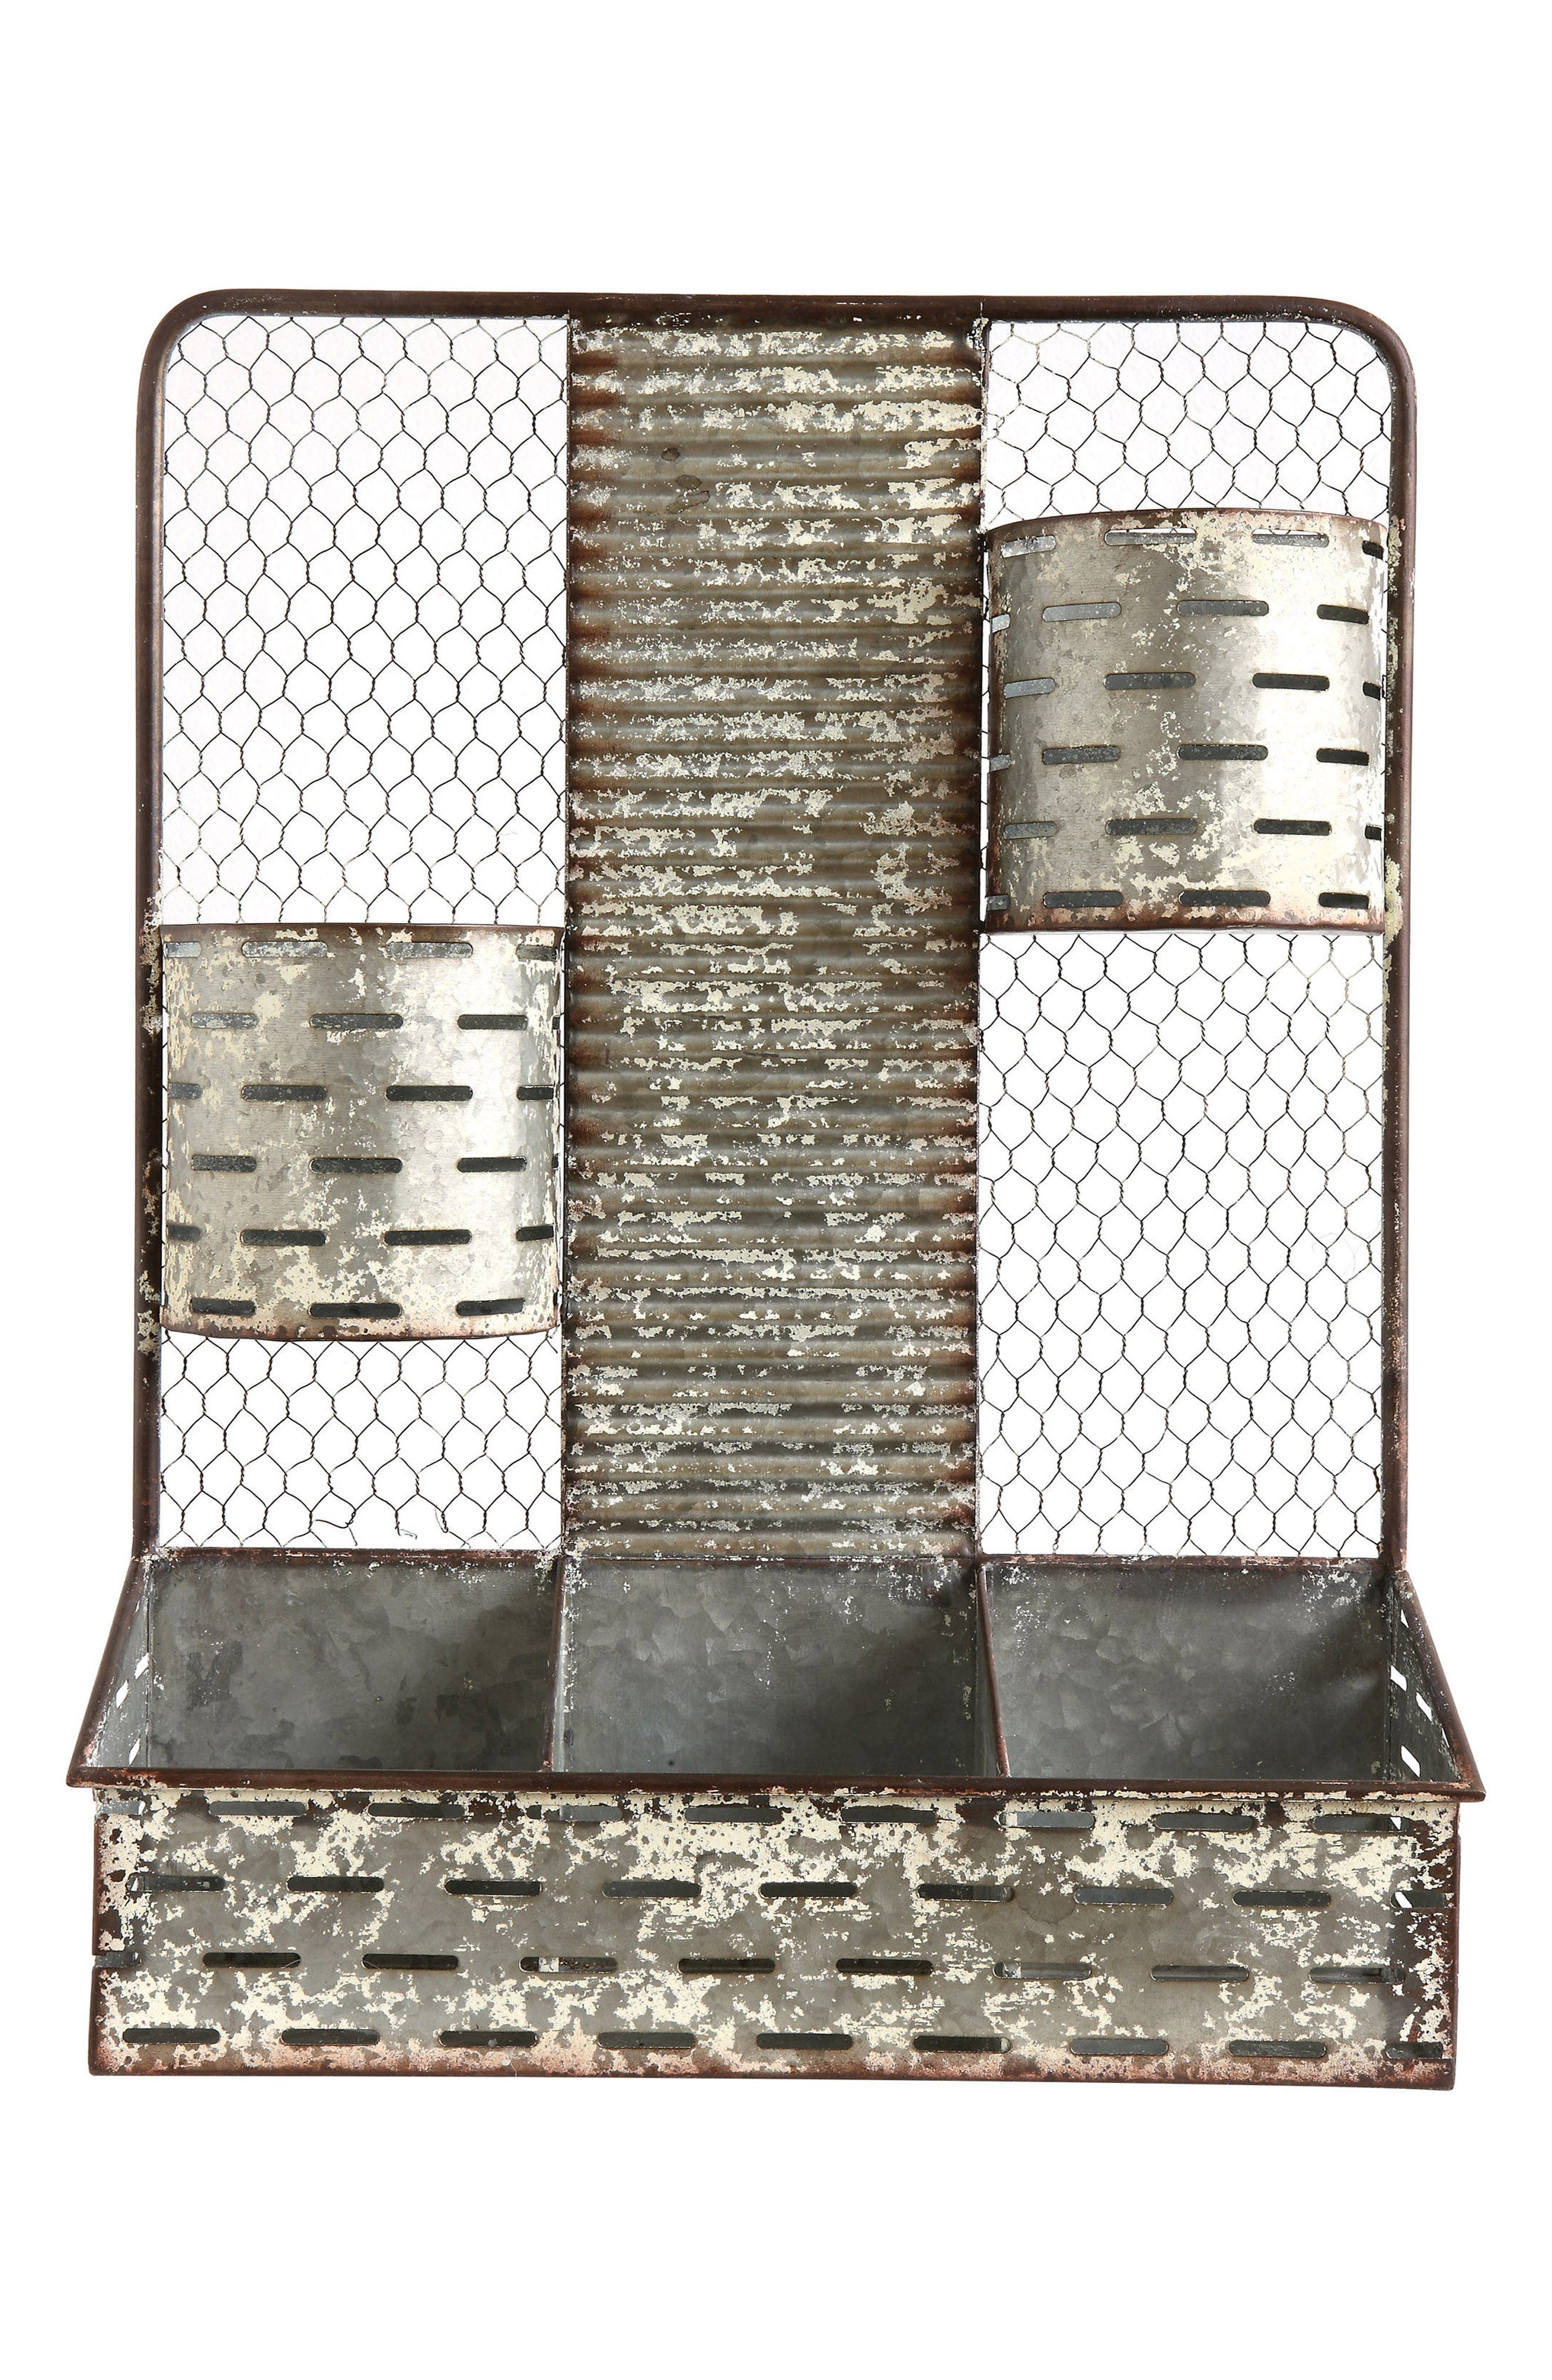 5-Compartment Metal Shelf Organizer,                             Main thumbnail 1, color,                             020